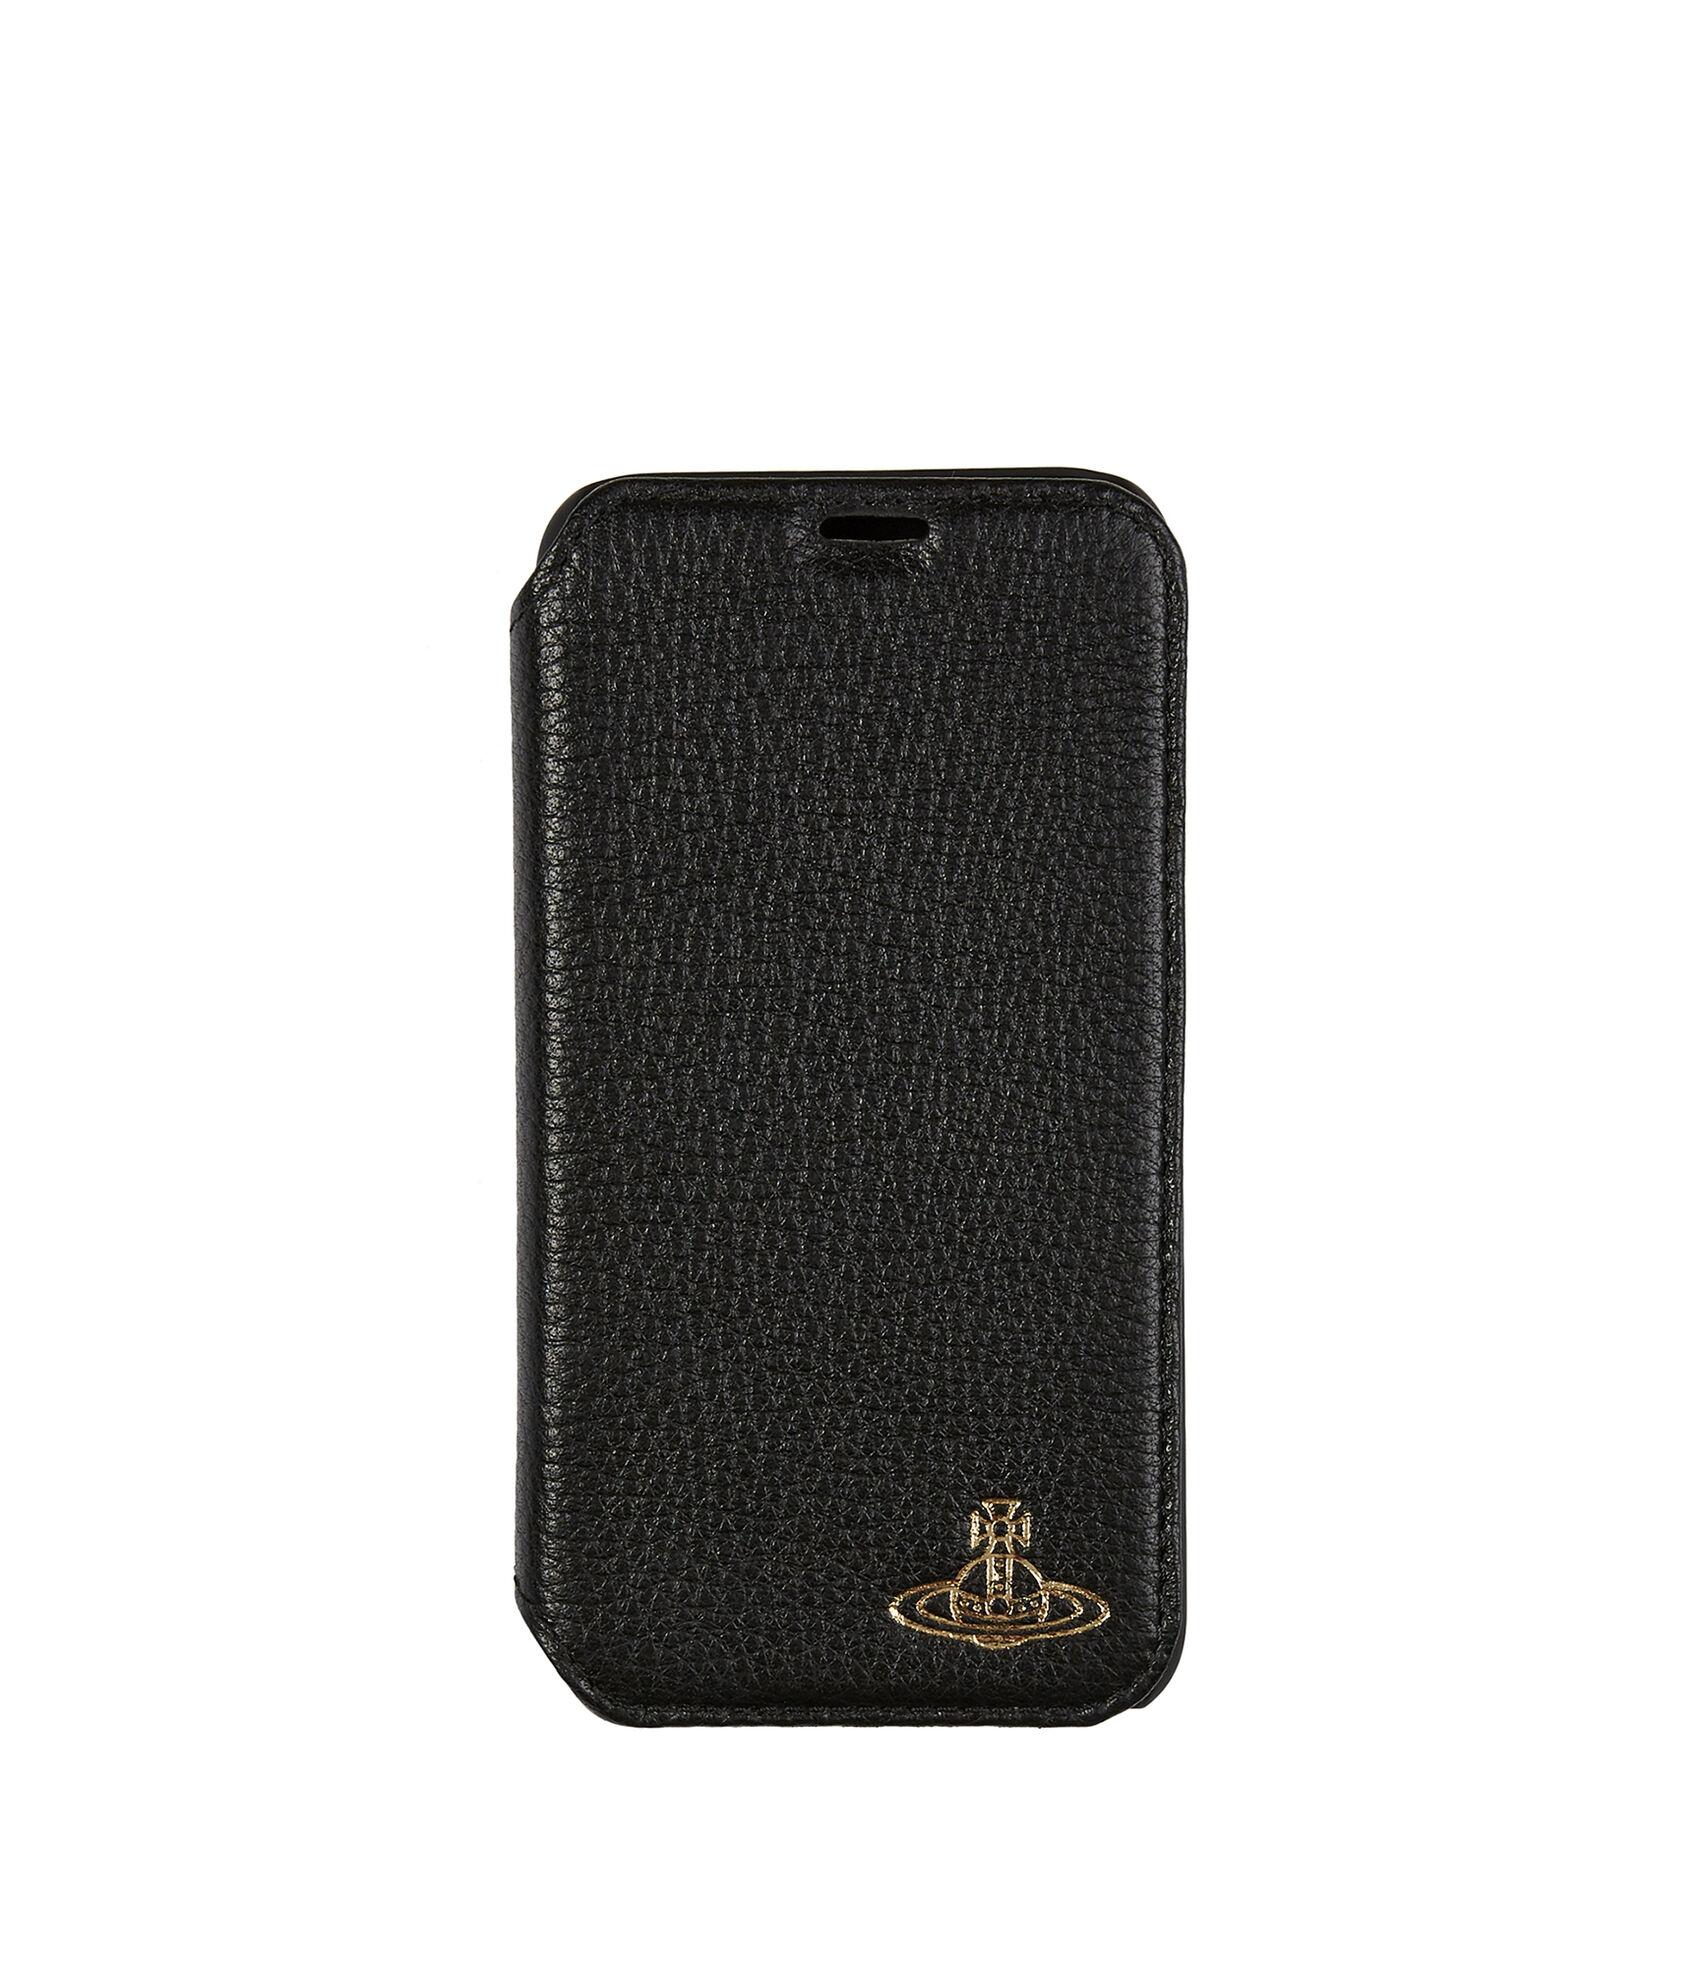 new concept f3baa 1add4 Vivienne Westwood Unisex Designer Accessories   Vivienne Westwood - IPHONE  X/XS – IPHONE WALLET CASE